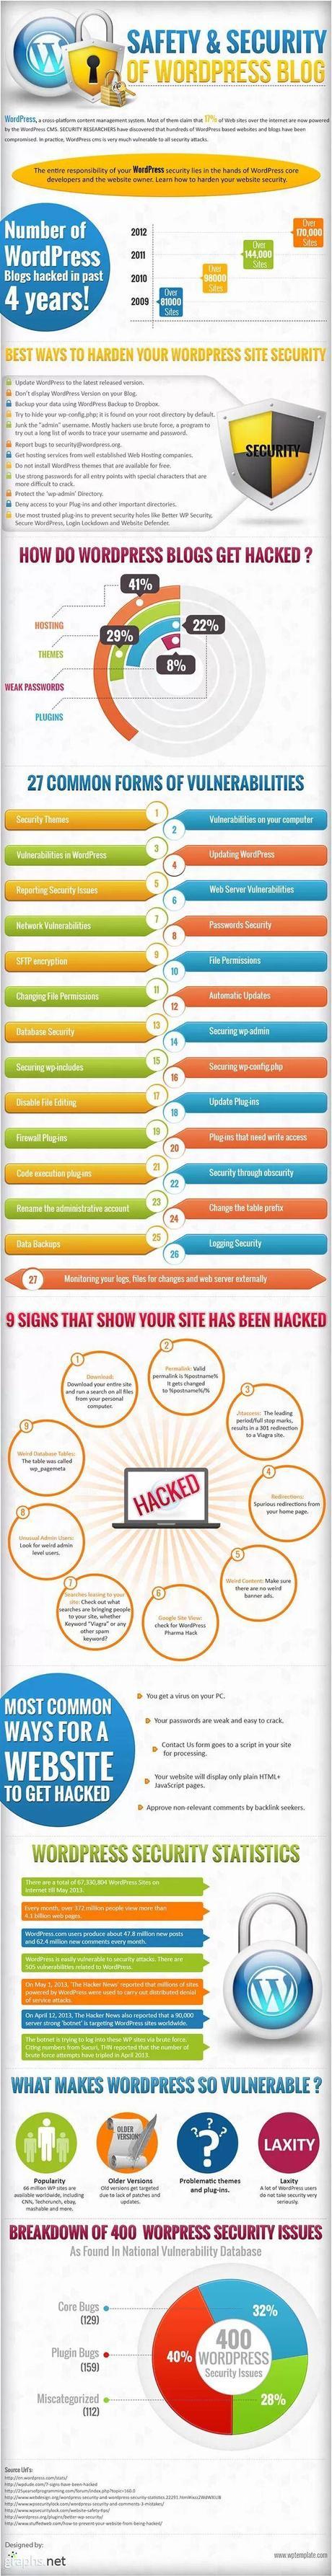 safety-security-wordpress